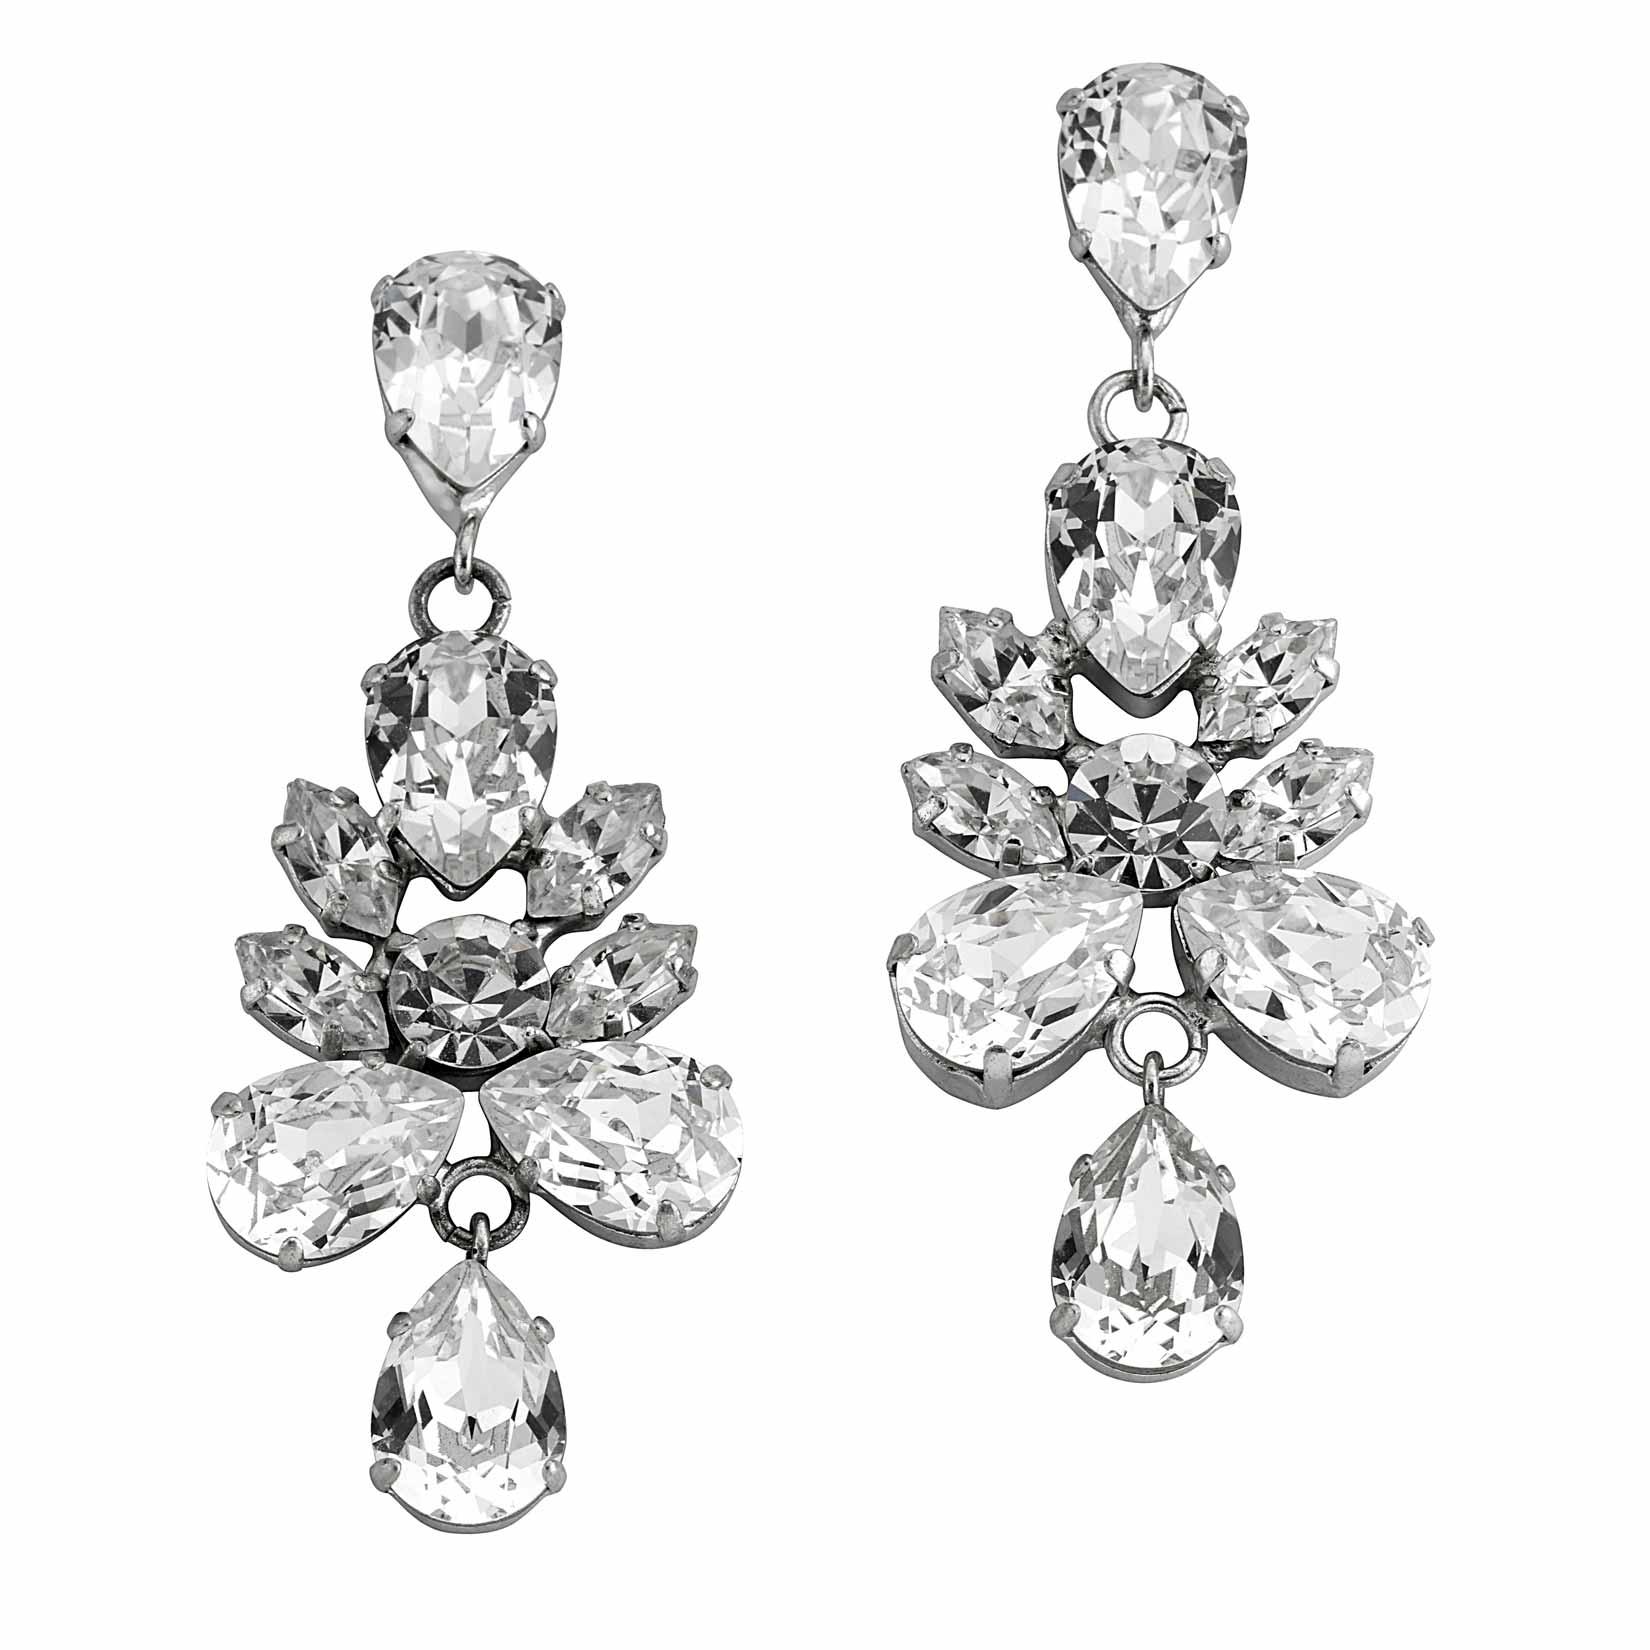 Reverse Cluster Earrings, £150, Mews London. www.mews-london.com